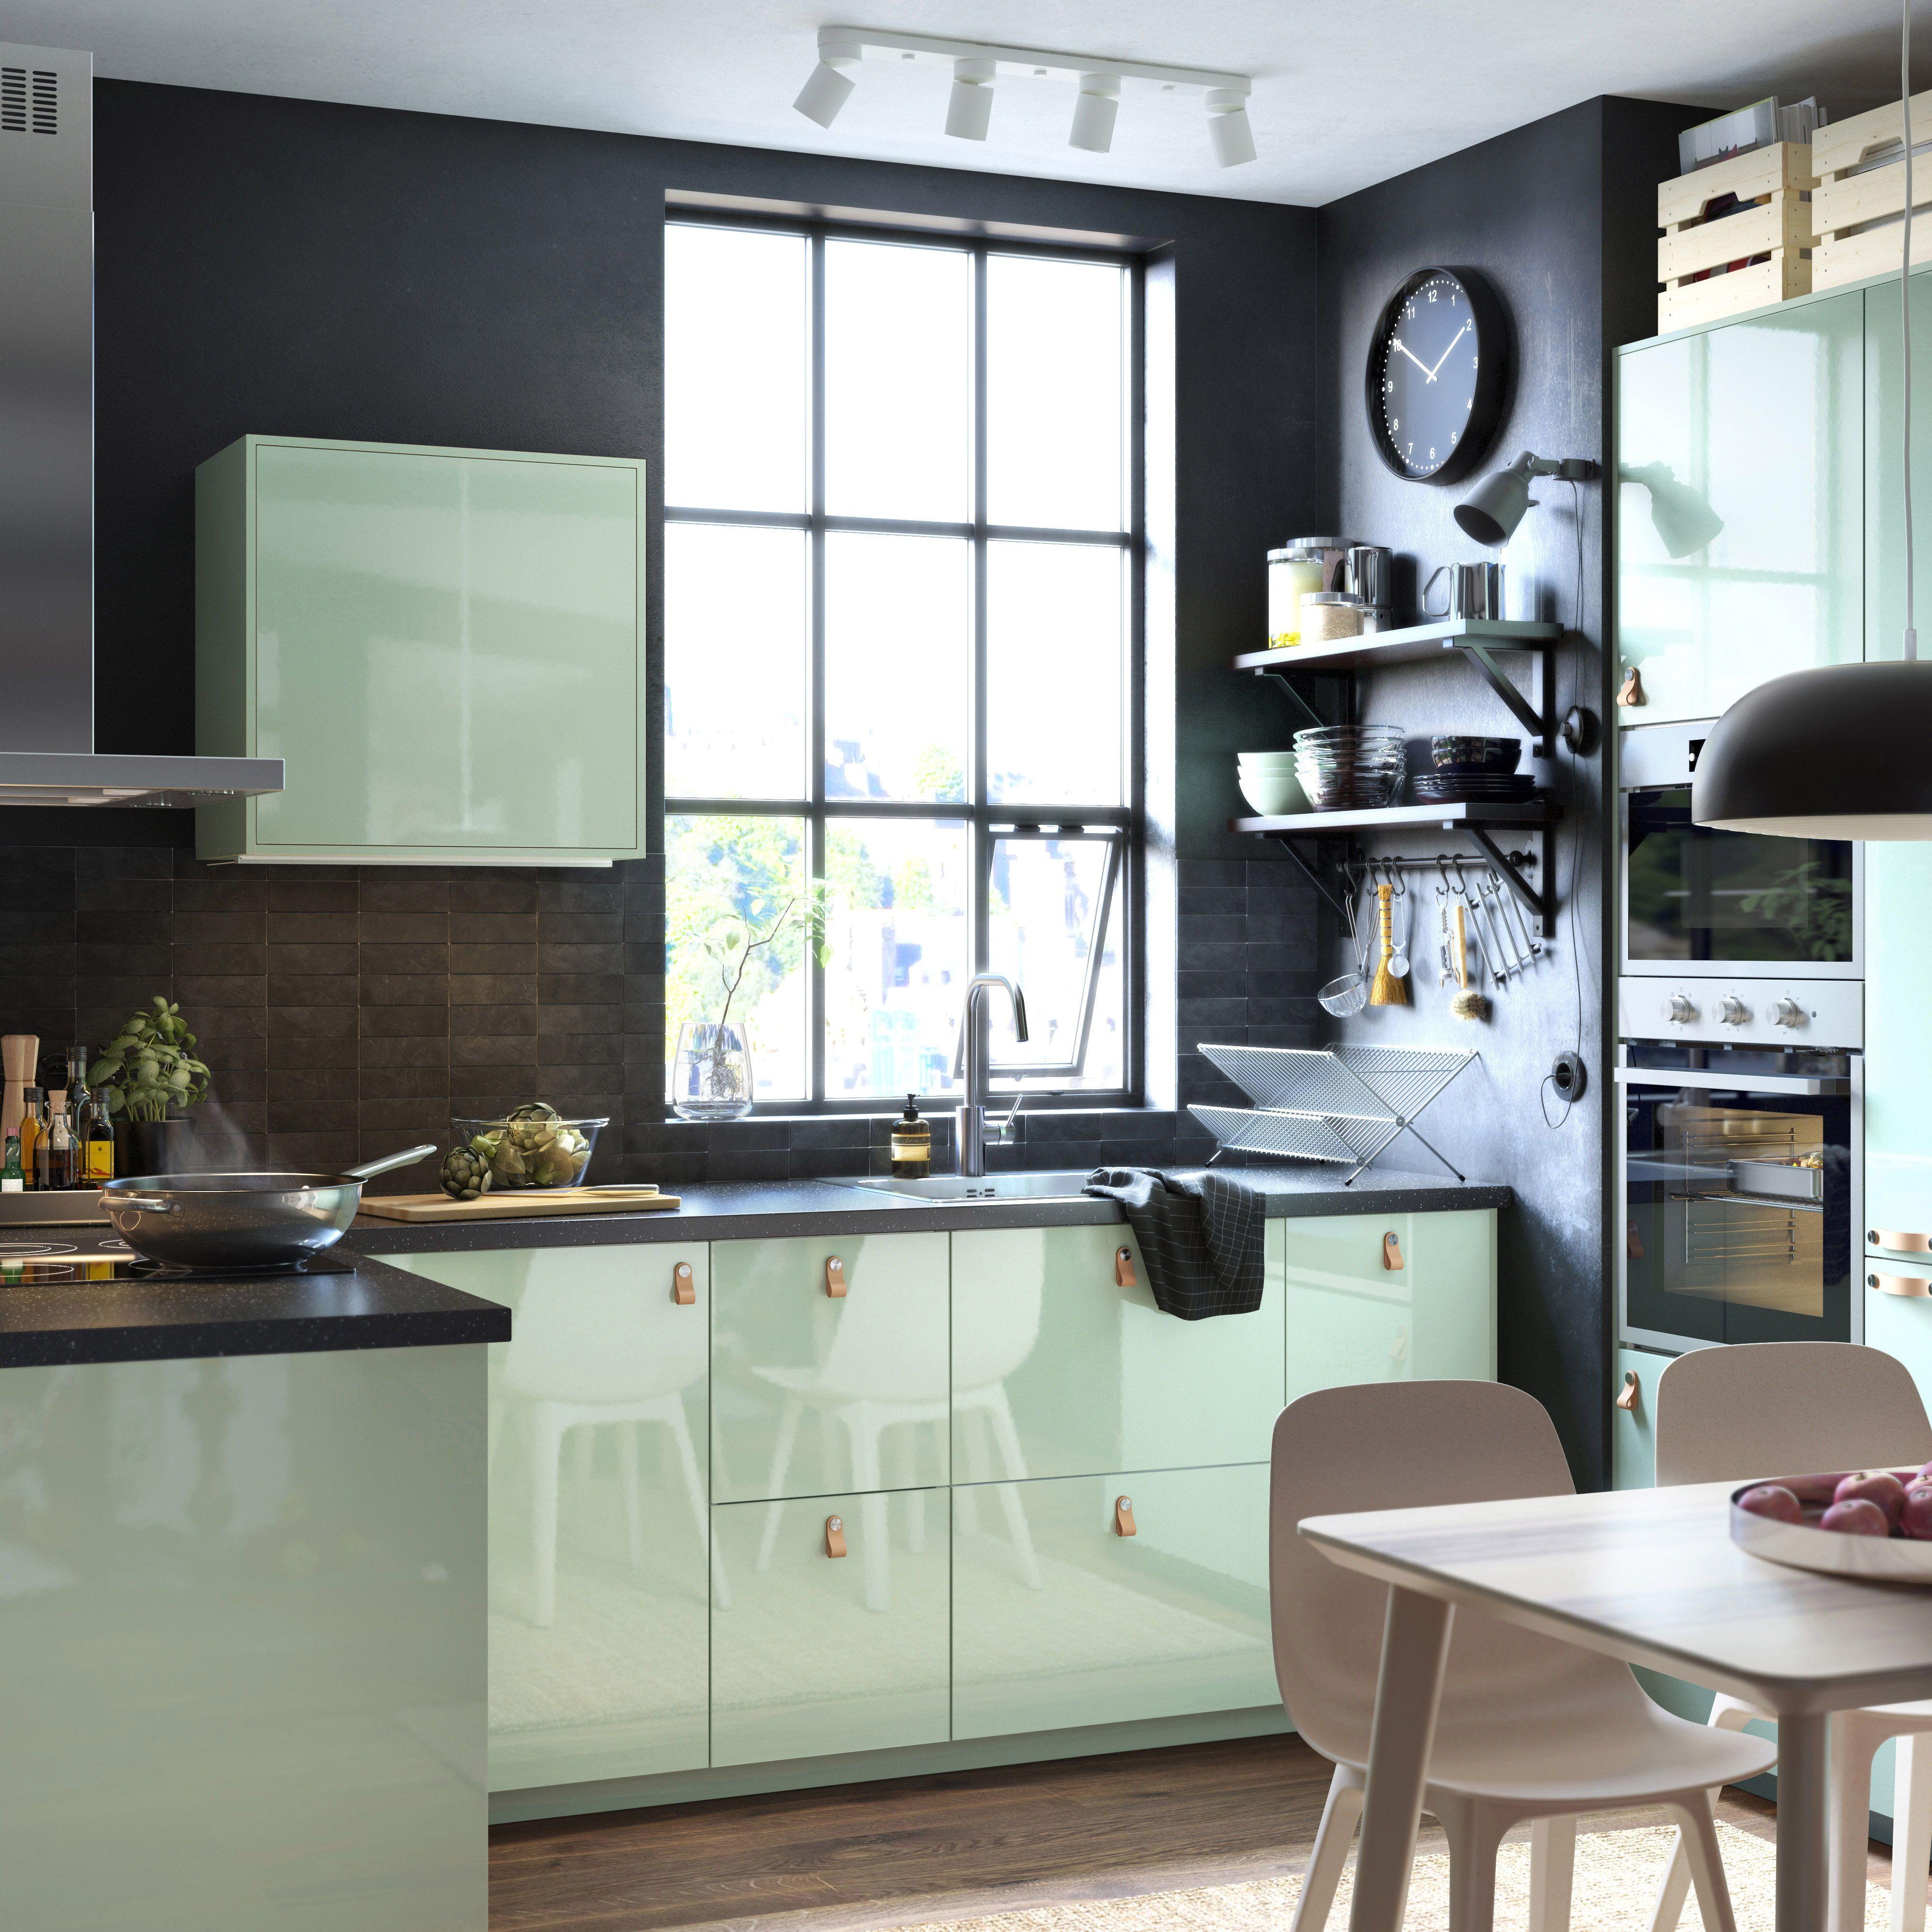 Producten Ikea Keuken Lichtgroene Keuken Keukenstijl